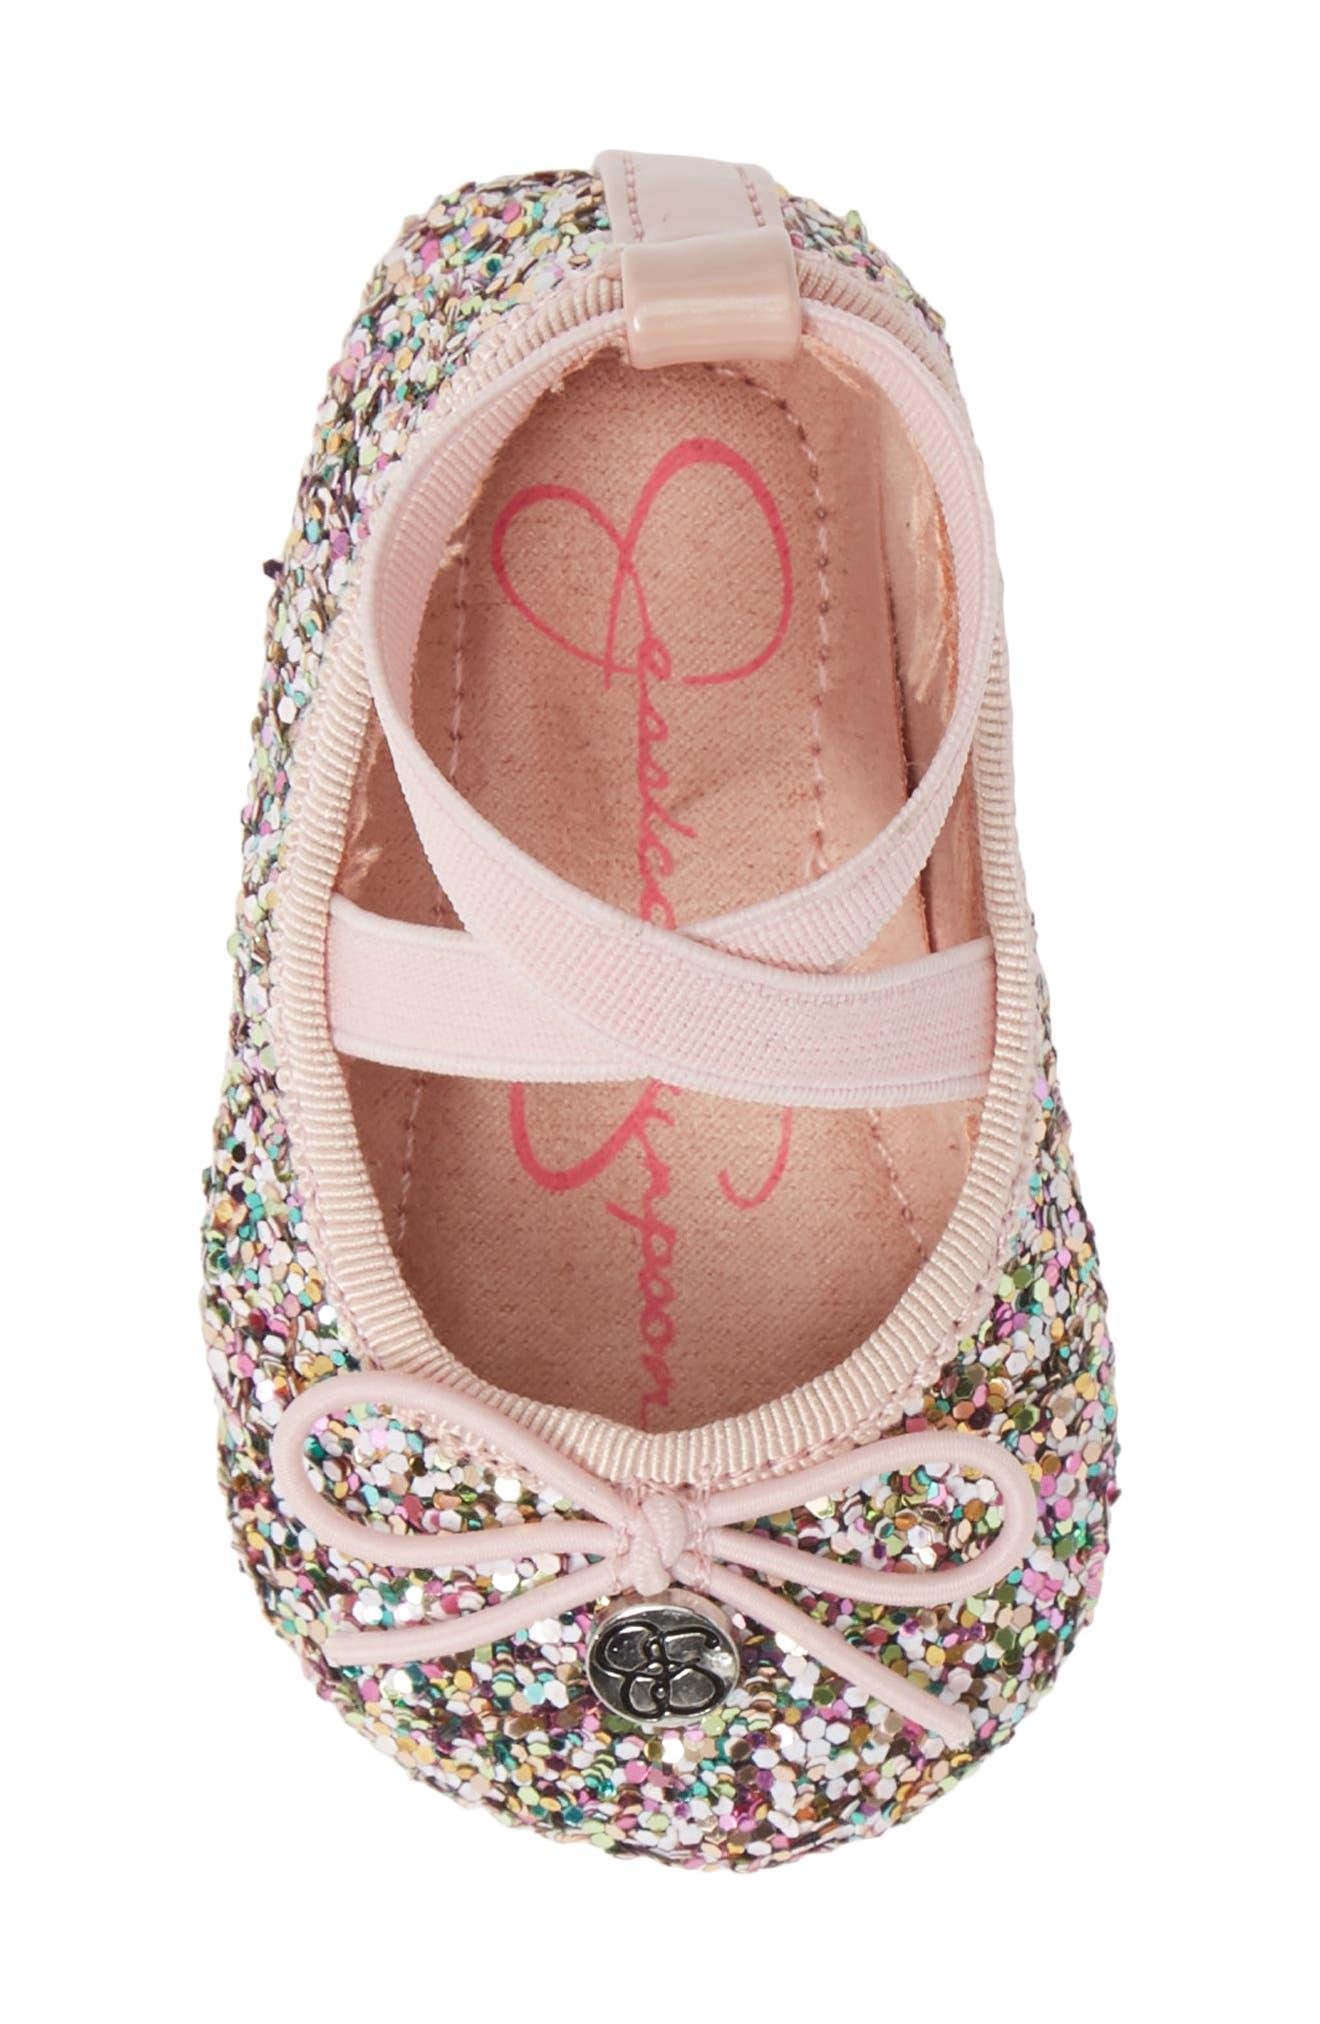 JESSICA SIMPSON, Glitter Mary Jane Crib Shoe, Alternate thumbnail 5, color, 650